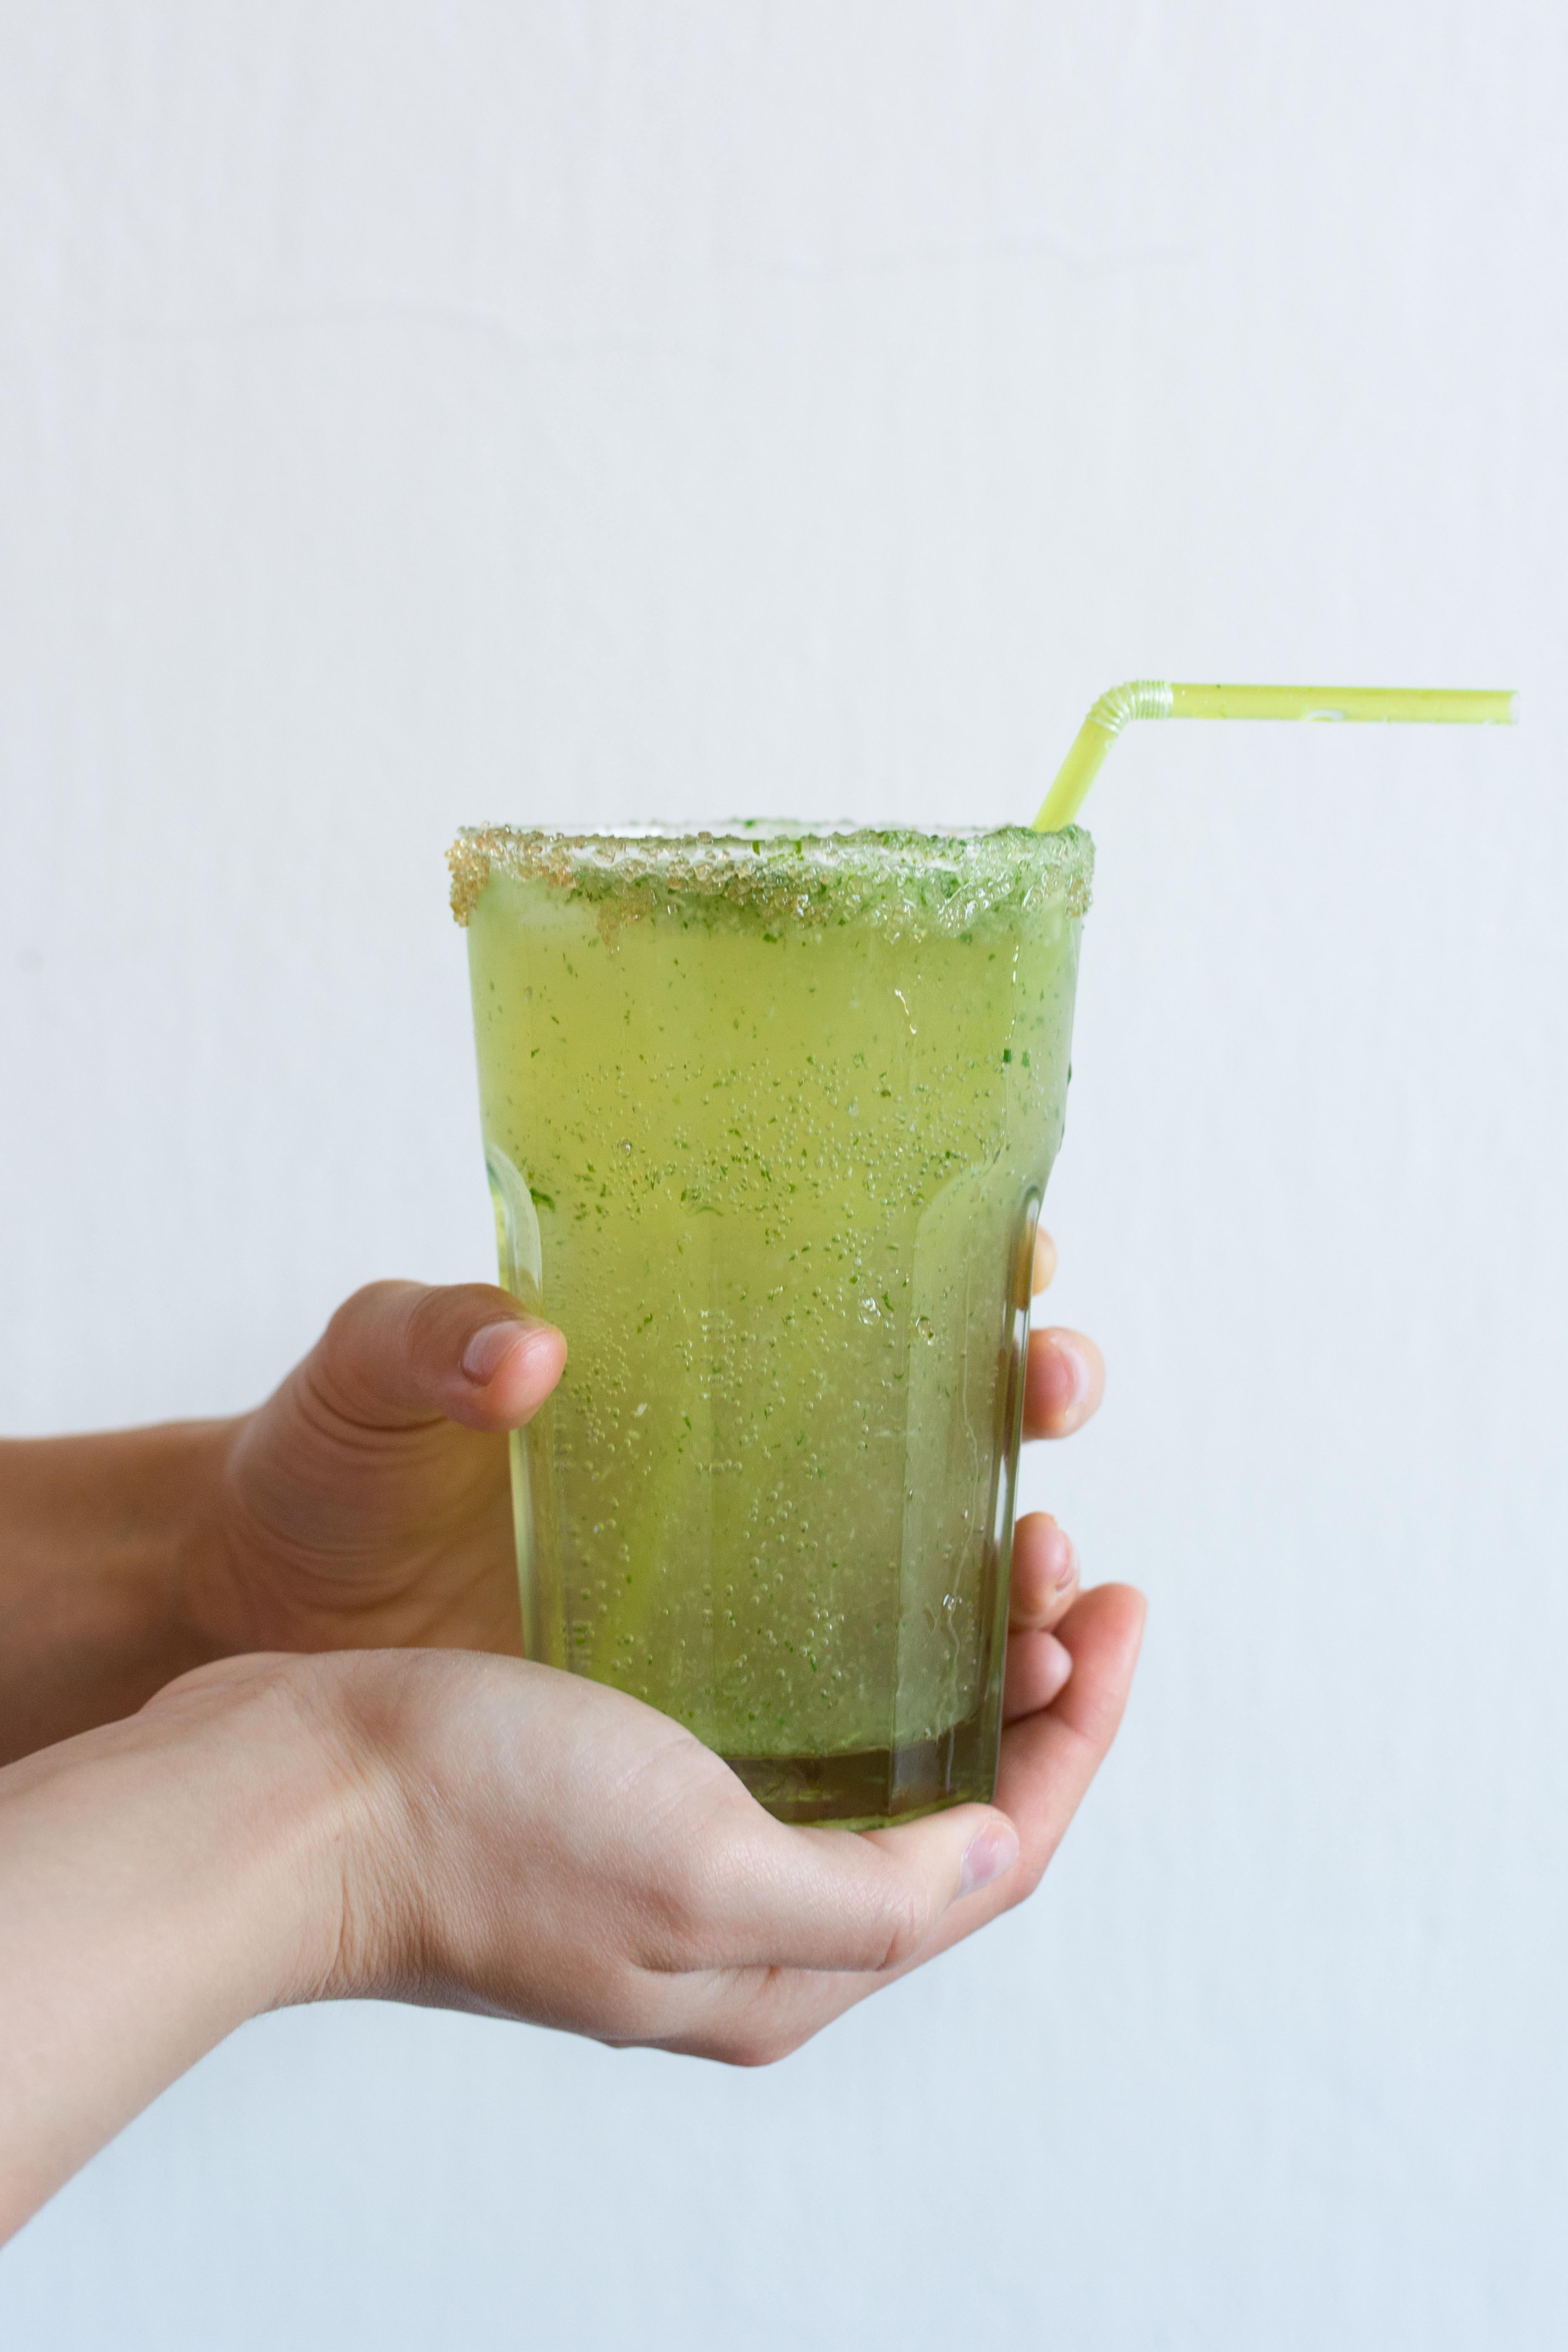 Glass of homemade cucumber lemonade